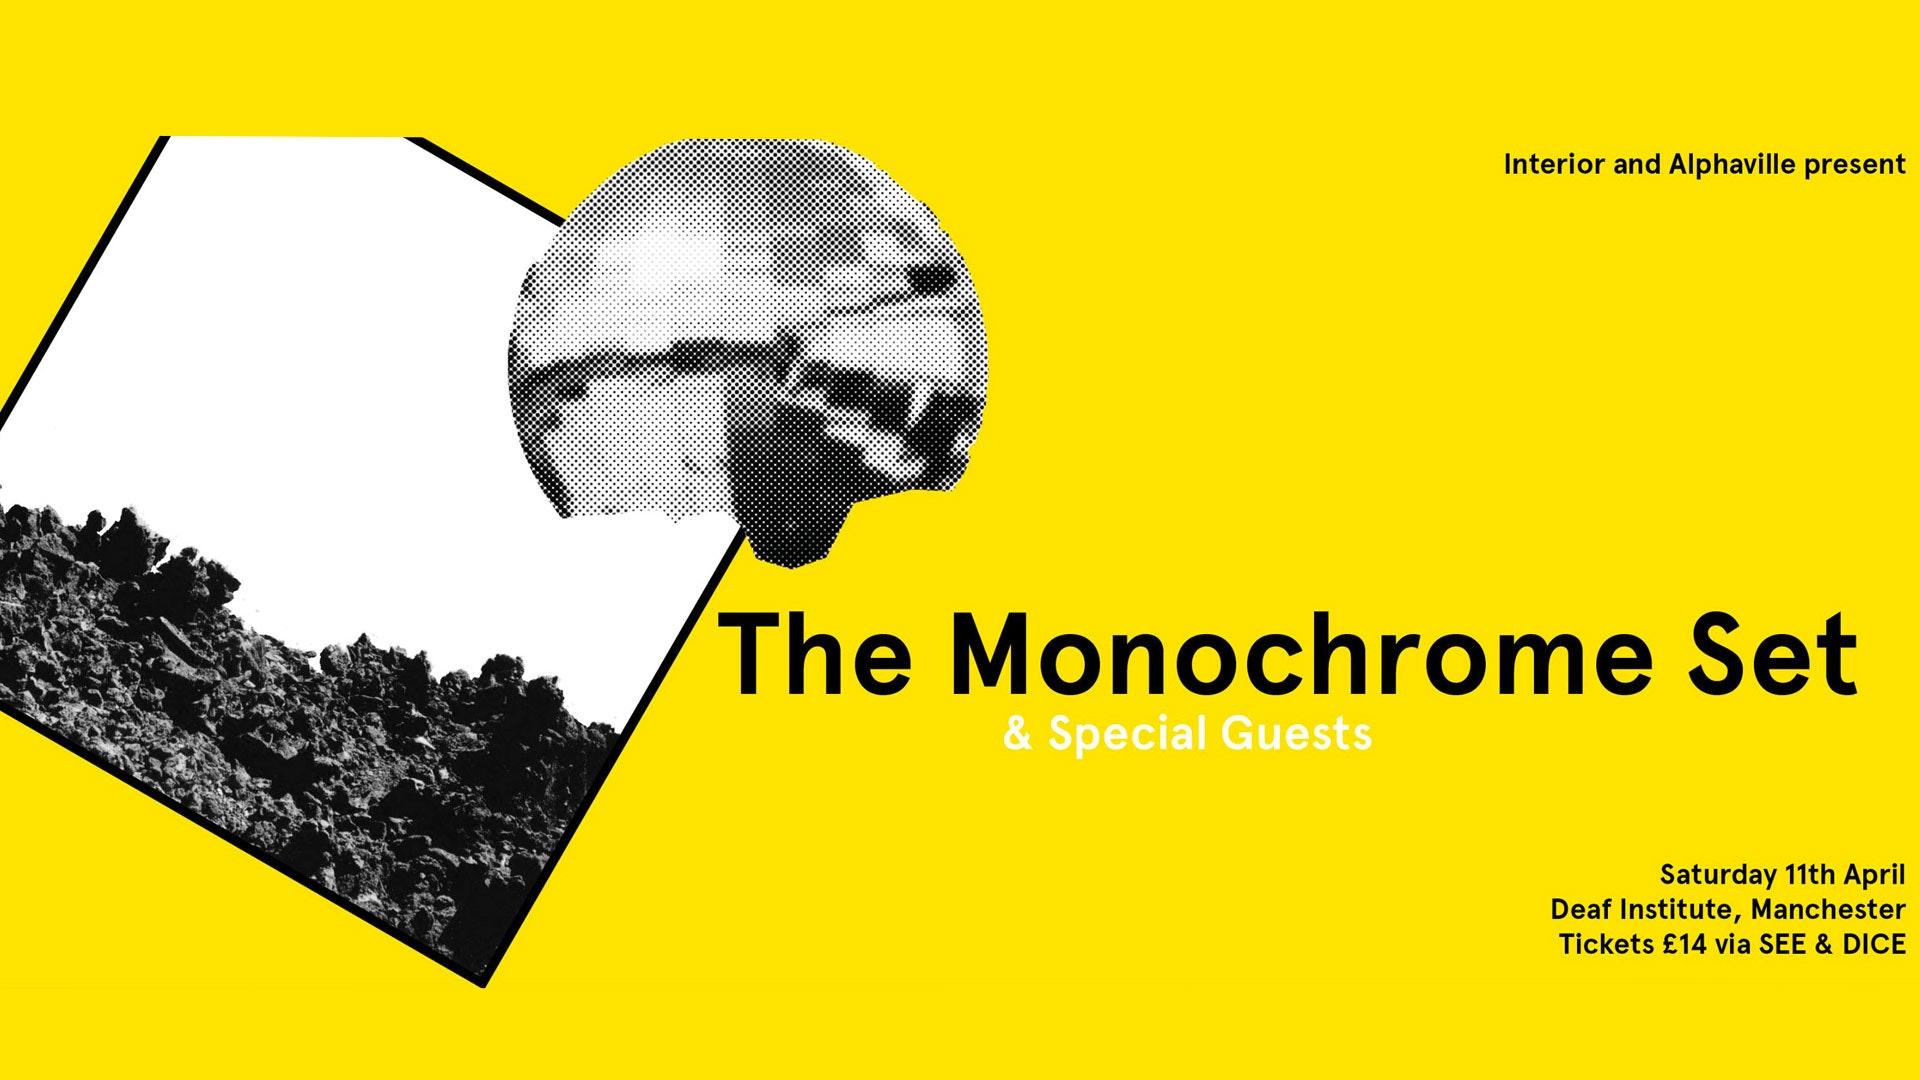 The Monochrome Set